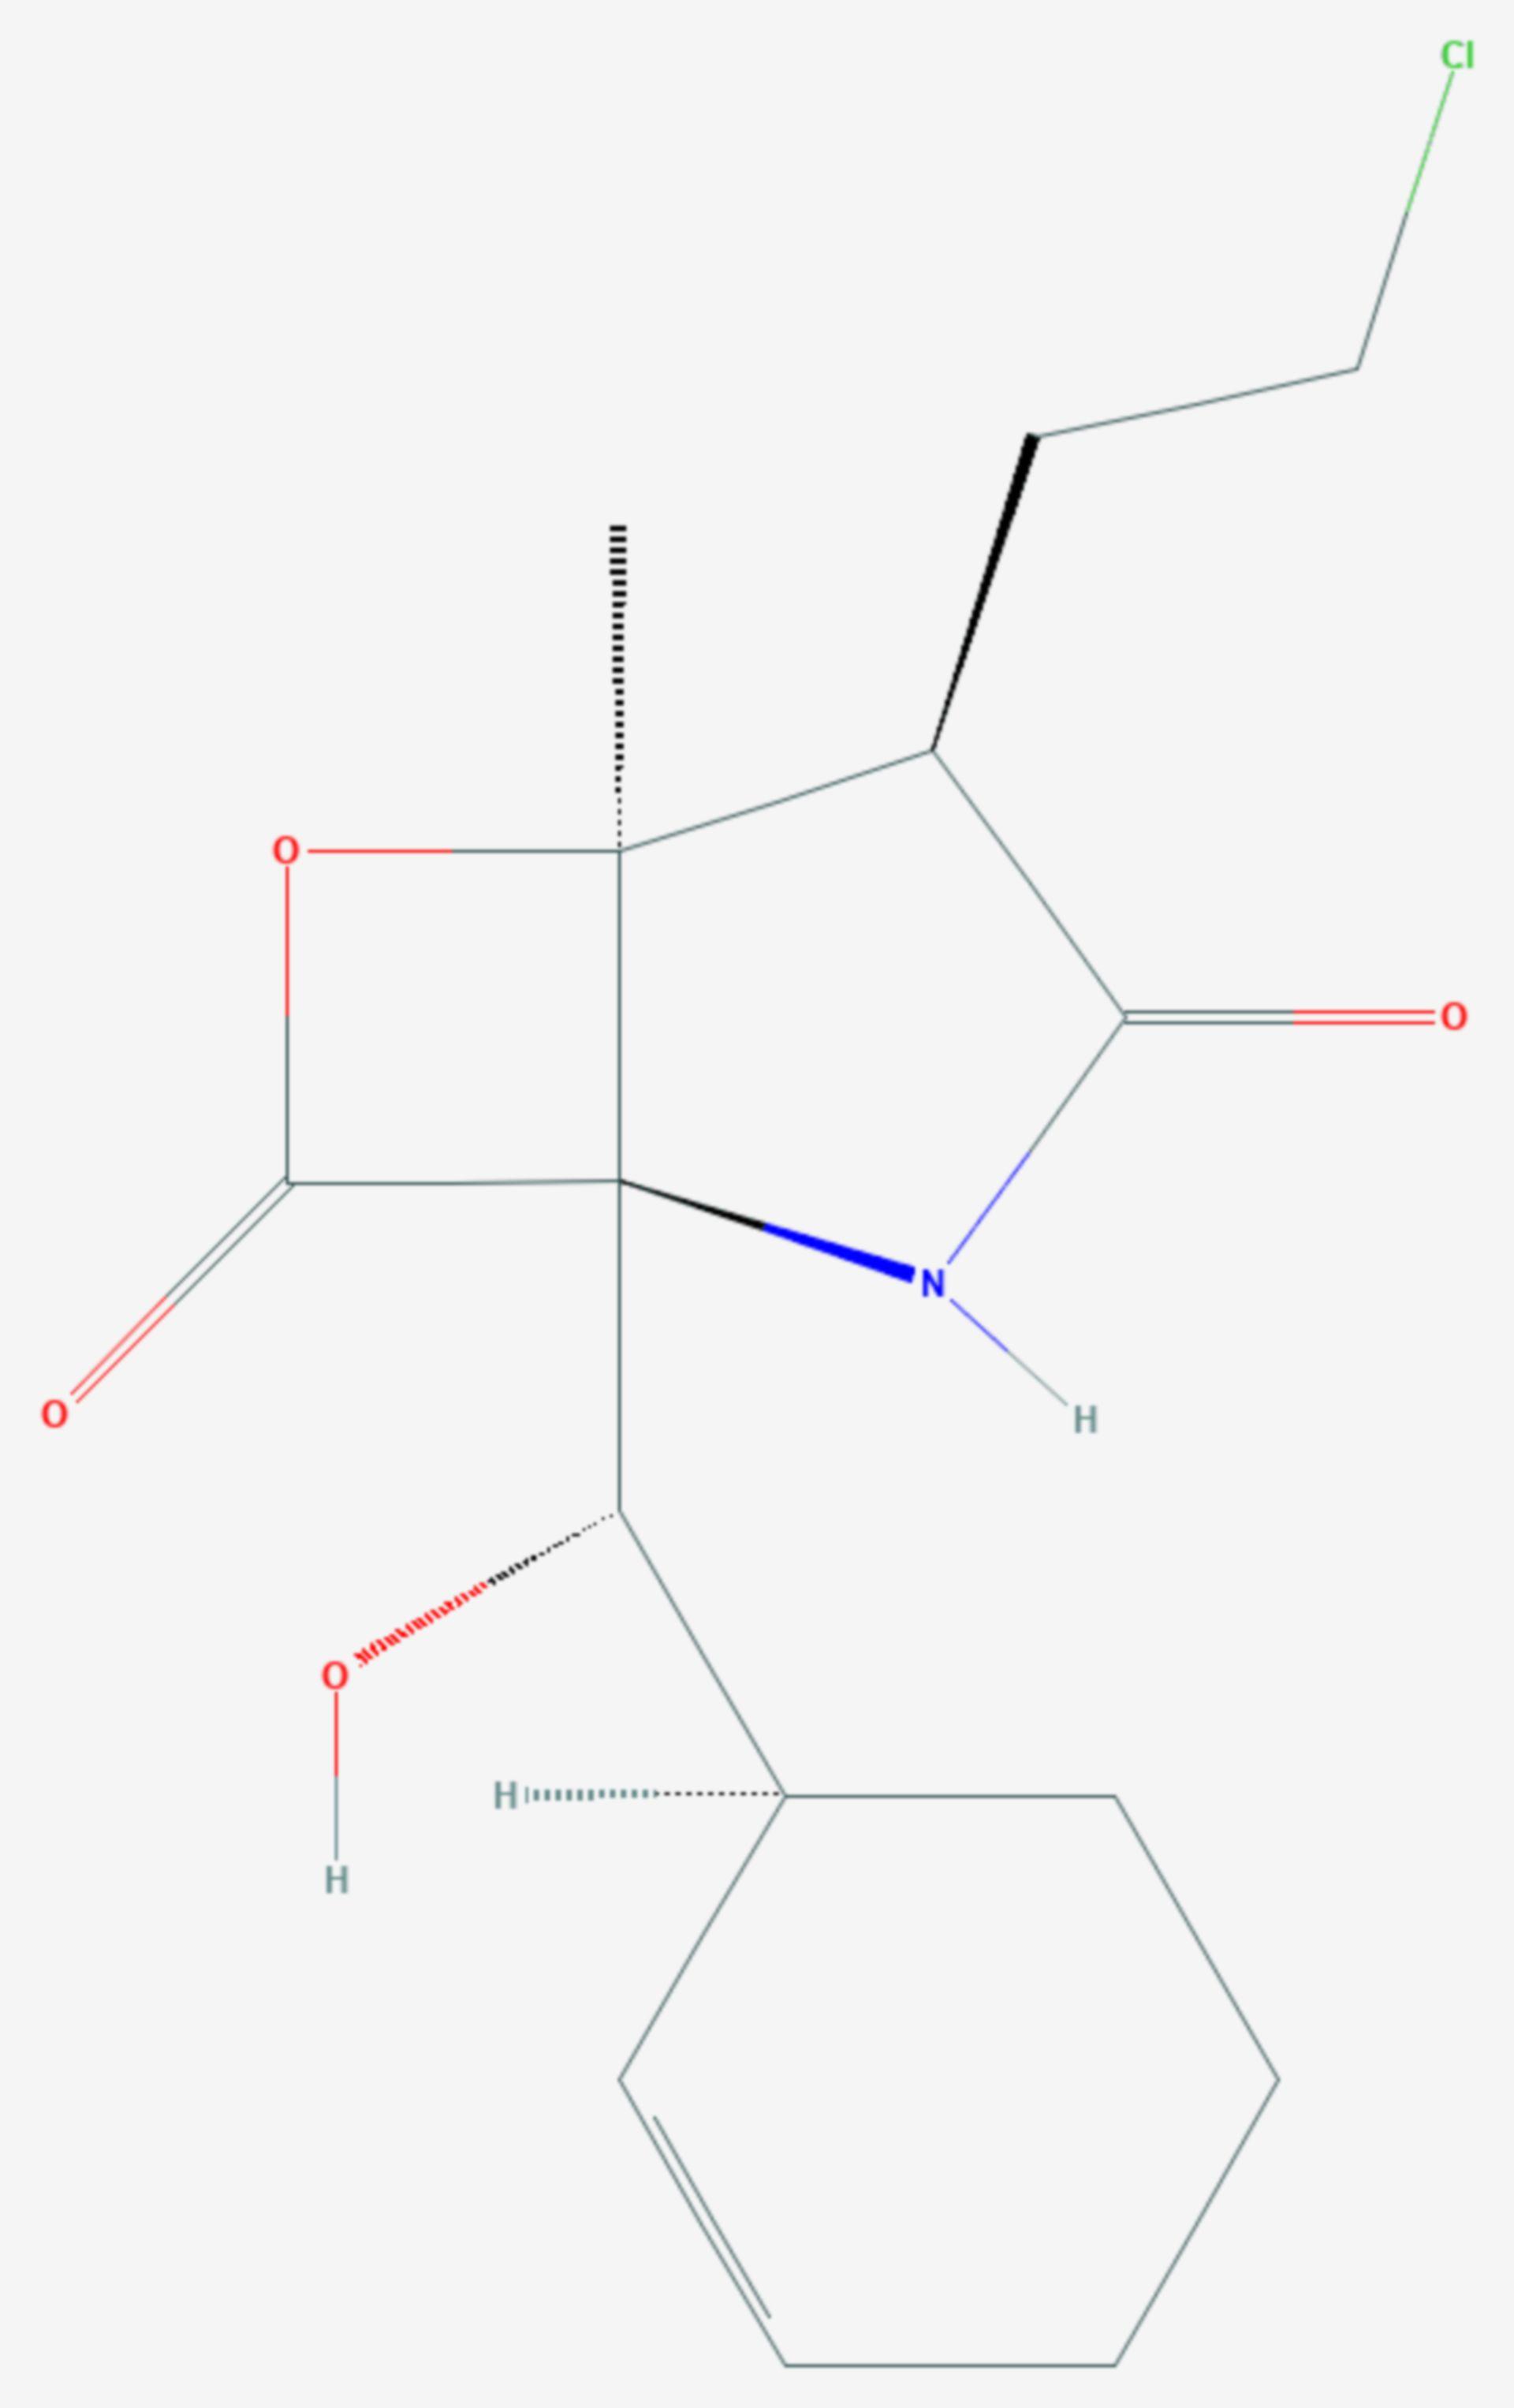 Salinosporamid A (Strukturformel)